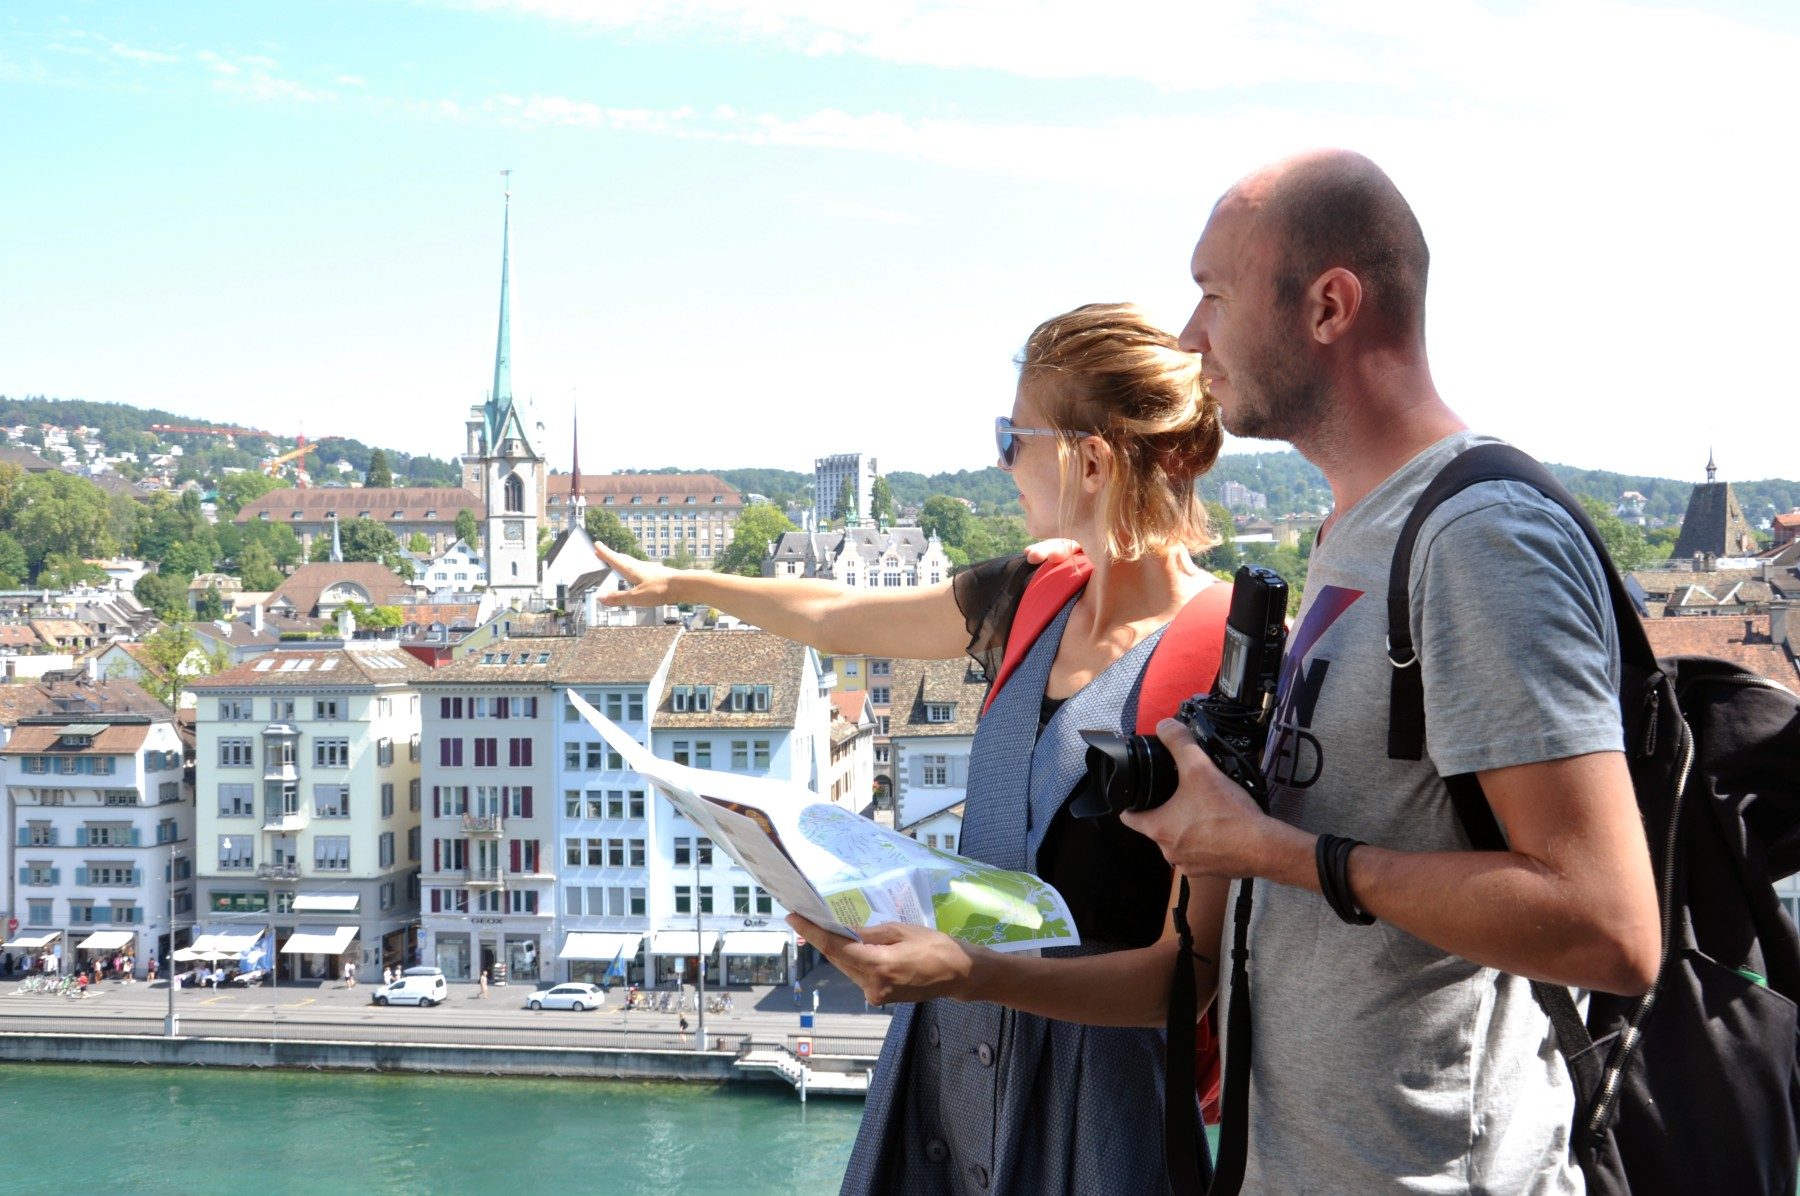 family reunification Switzerland, Swiss couple tour city